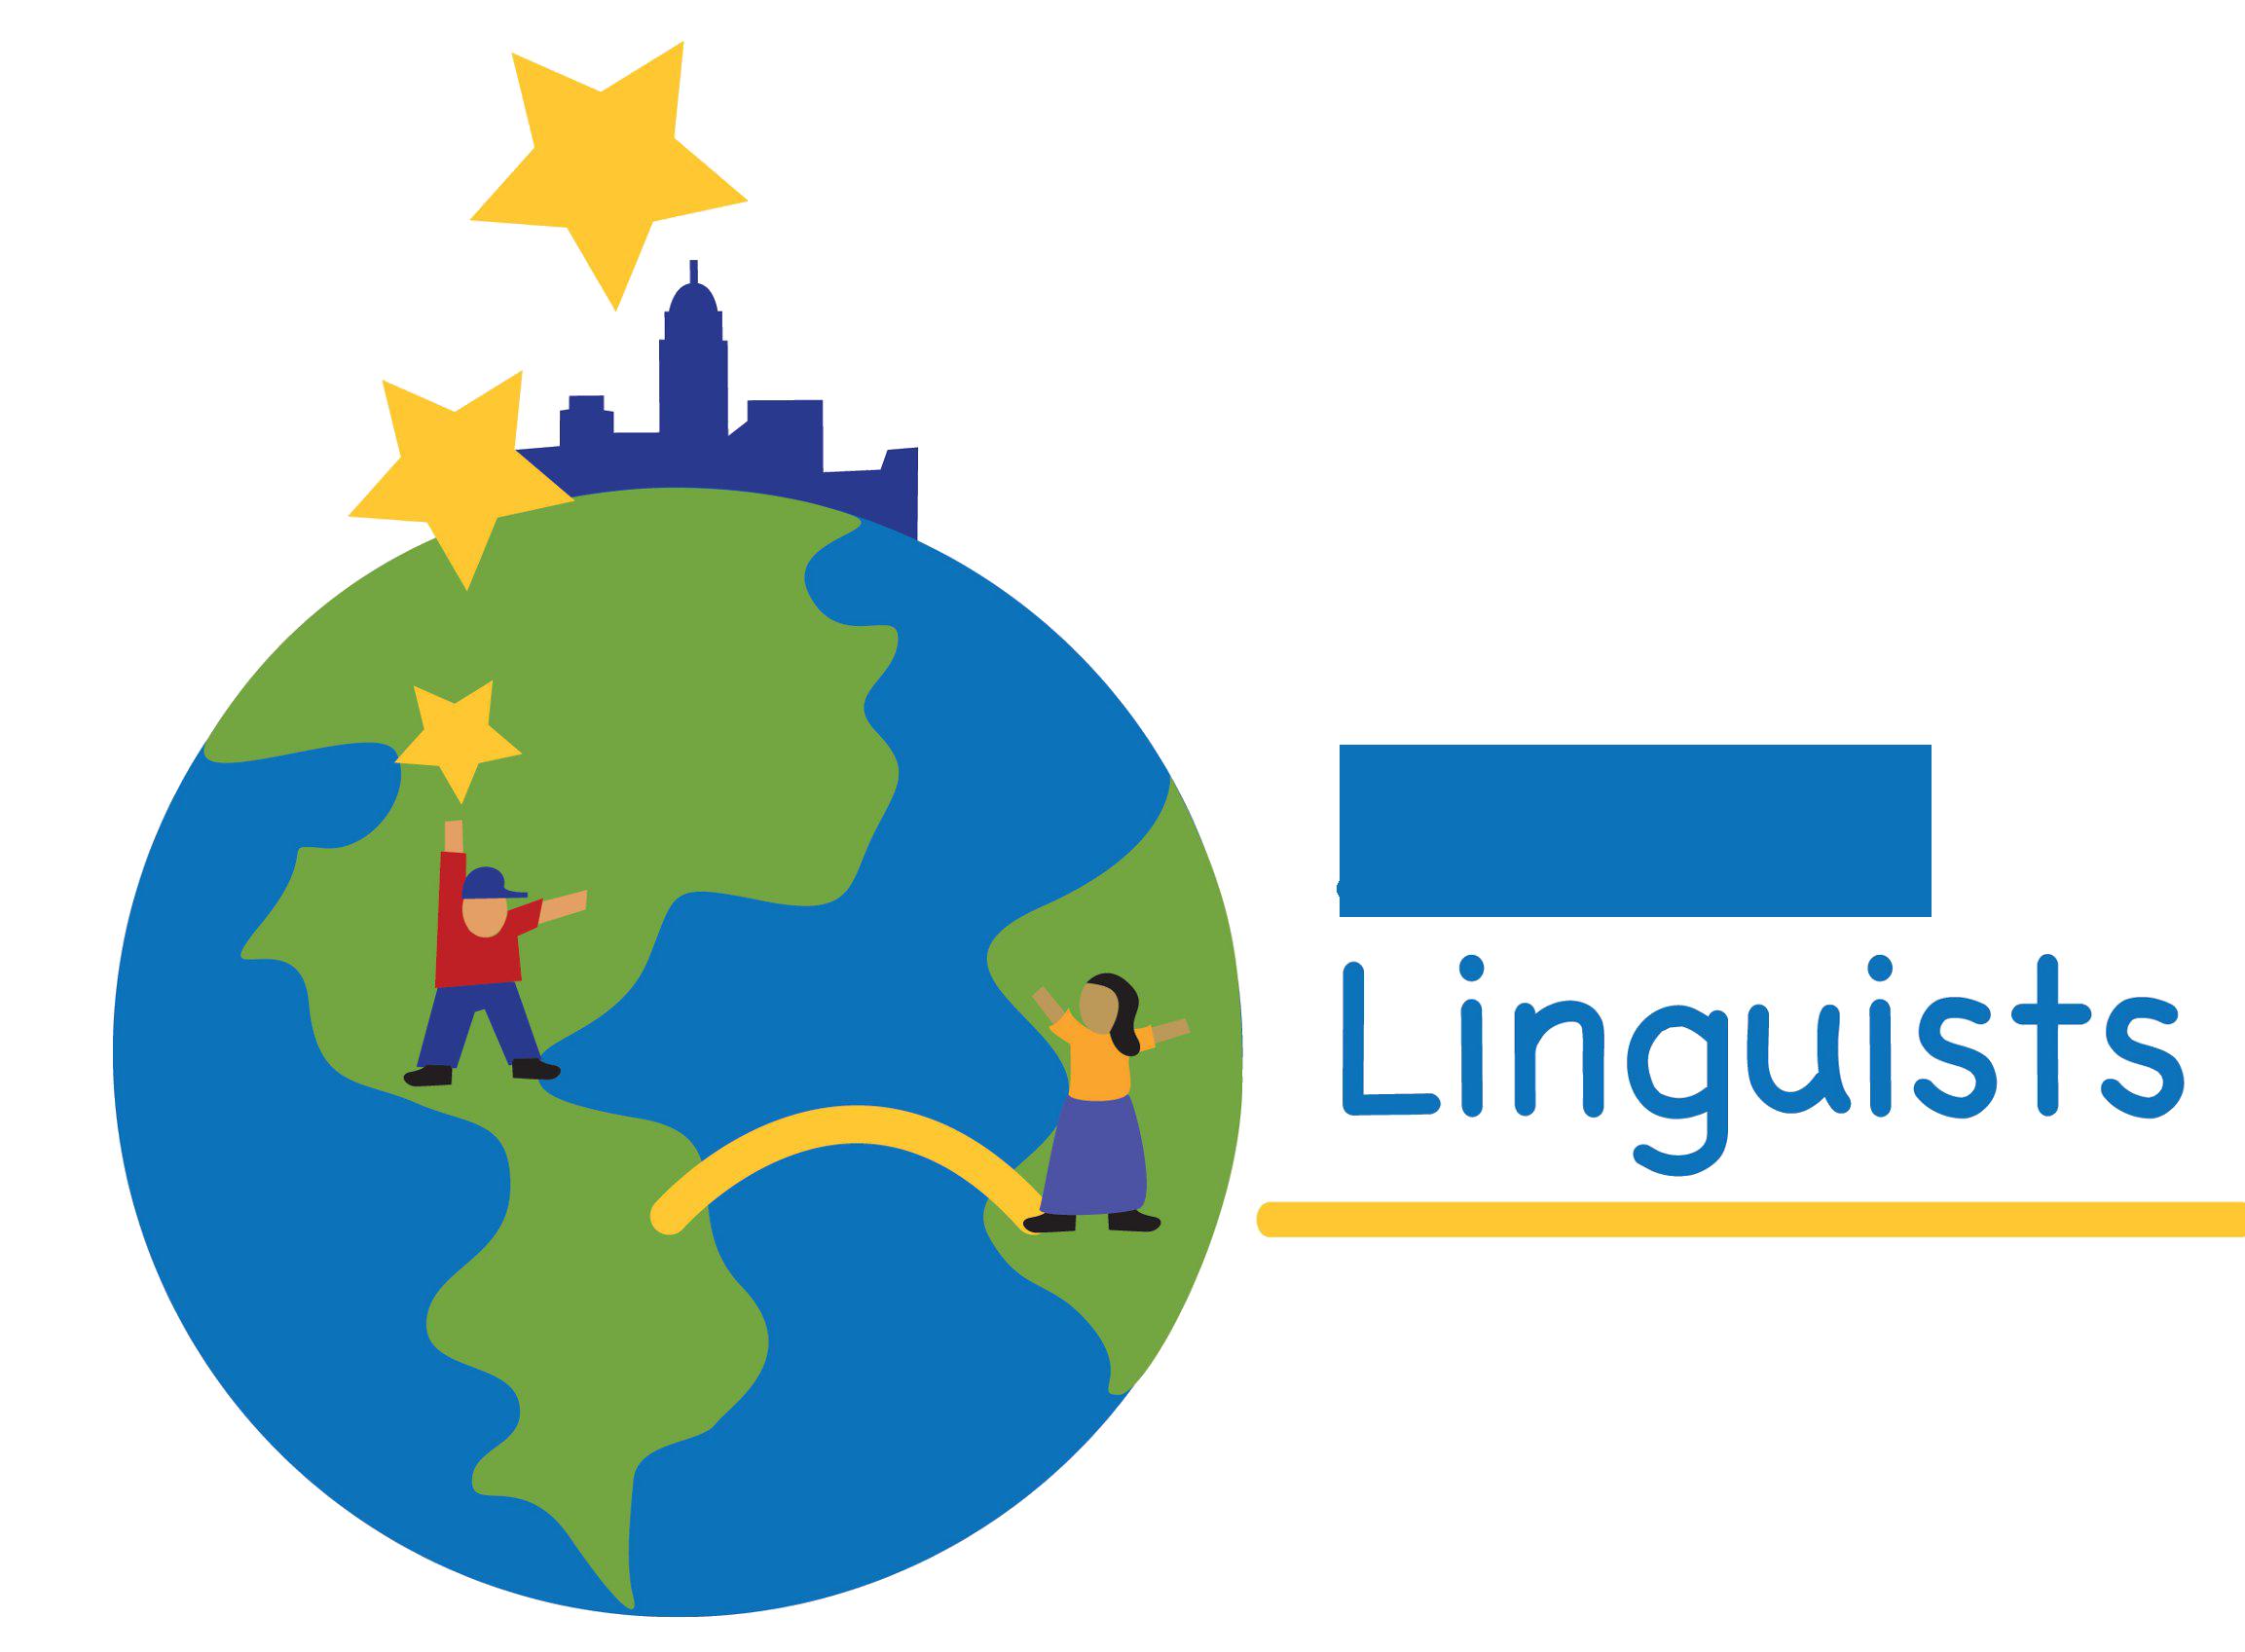 Words clipart linguist. Smart linguists scarsdale westchester